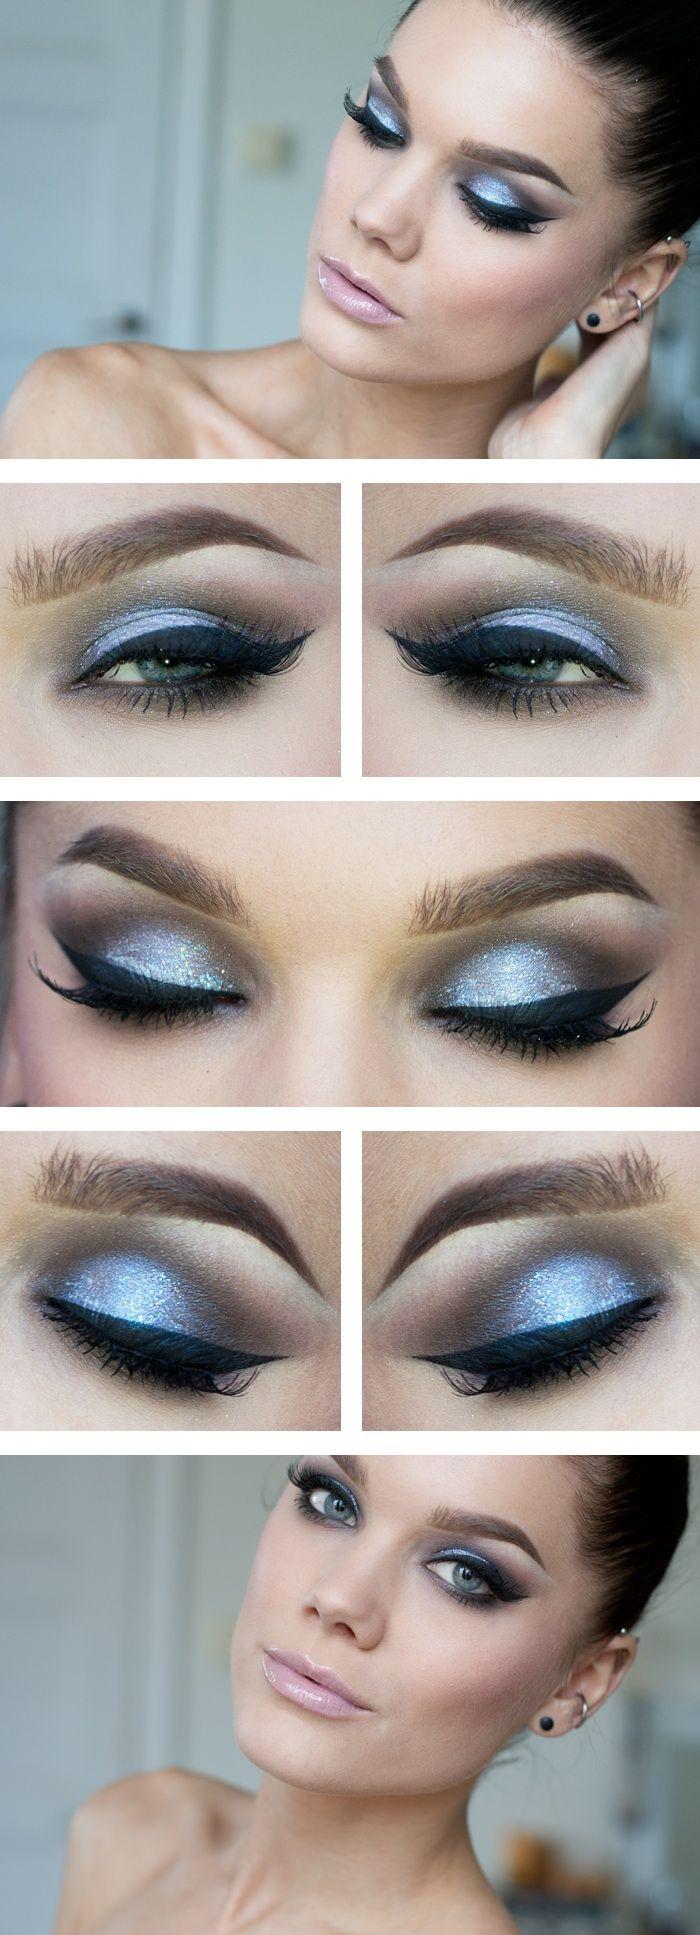 Tue.Oct.15/13, TODAYS LOOK - TIME TO LIVE TIME TO LOVE.  I've used ... EYES: NYX HD eyeshadow base, NARS At first sight eye & cheek palette, BellaPierre ögonskugga i färgen Exite, Viva la diva crystal eyeliner 23 Diamond, MUS Cake eyeliner black, Isadora Wig Wham mascara, Dr Hauschka Kajal eyeliner 06, Eldora false eyelashes H152.  LIPS: MAC Mineralize rich Luxe naturale, MUS Lipgloss wand daisy.  CHEEKS: NARS blush Orgasm, MUS Wonder powder Sinai